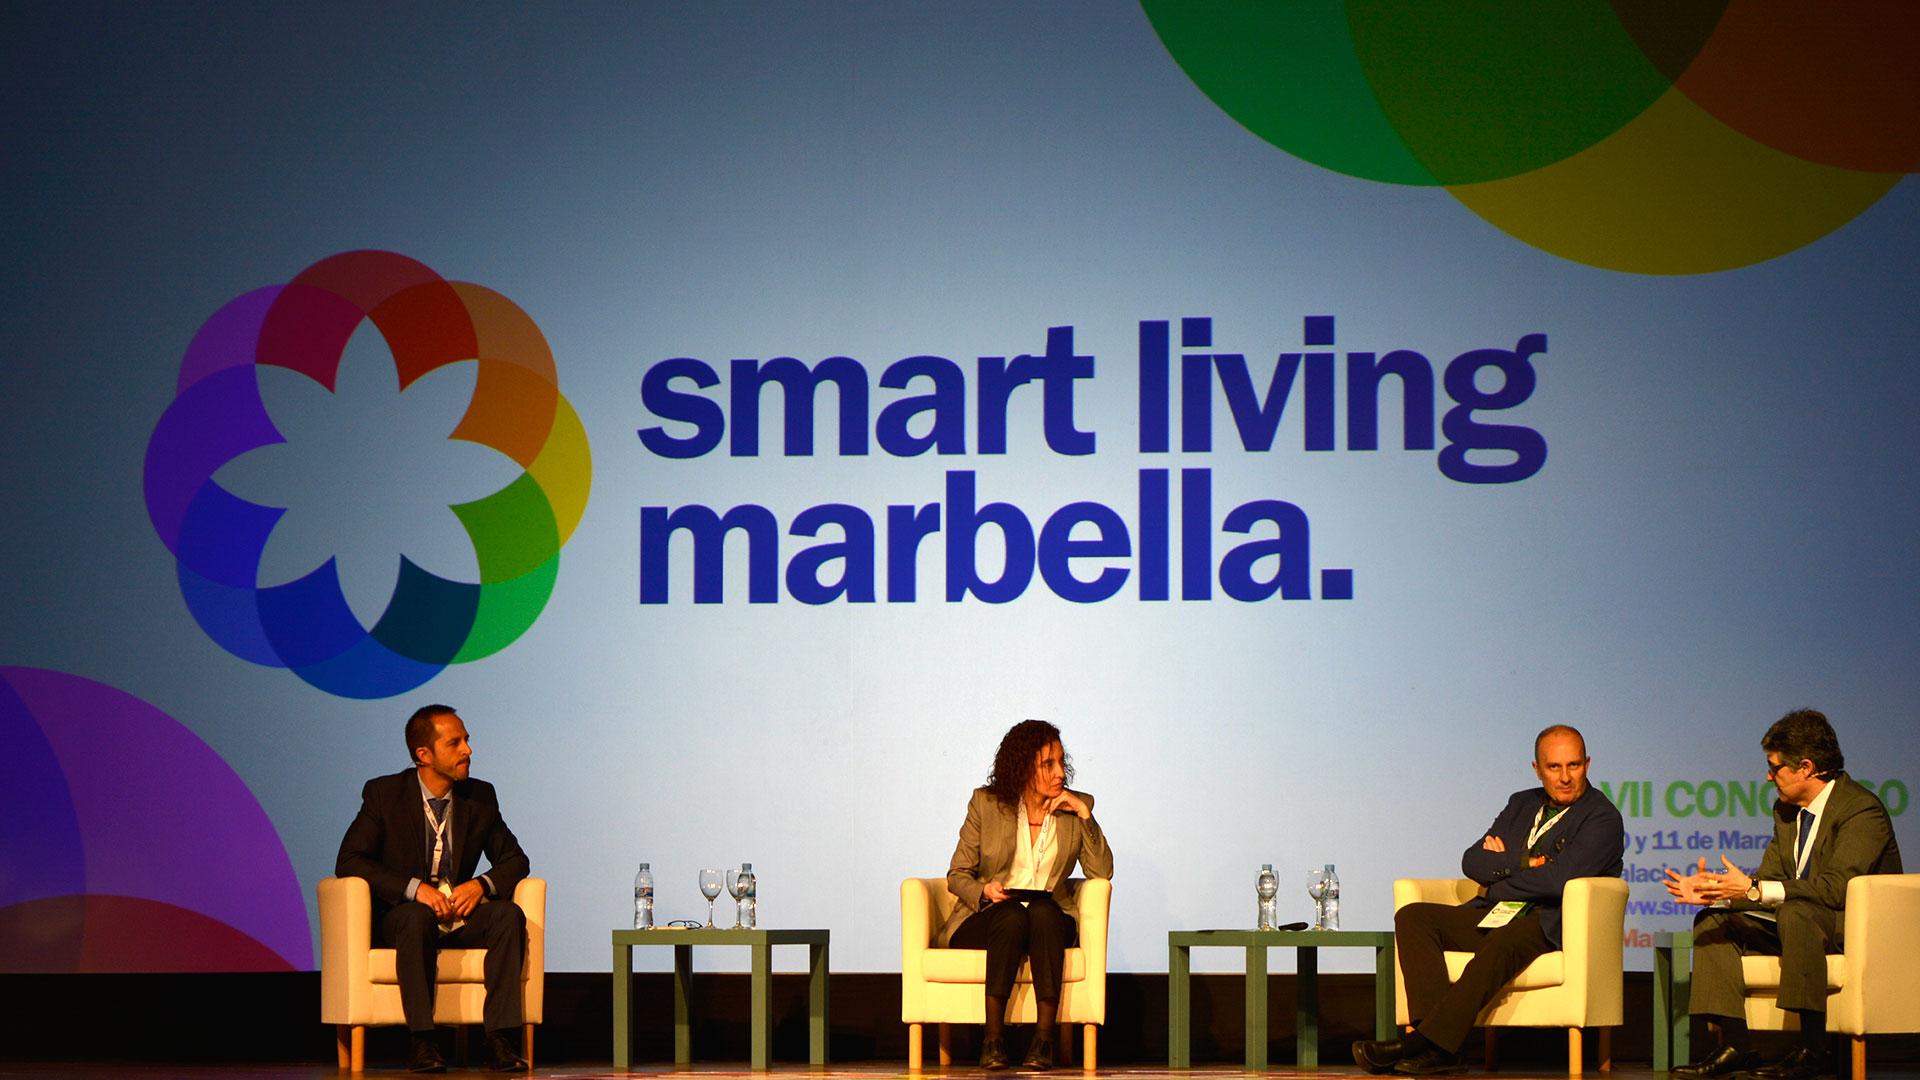 Smart Living Marbella 2016 - www.arianasoffici.com